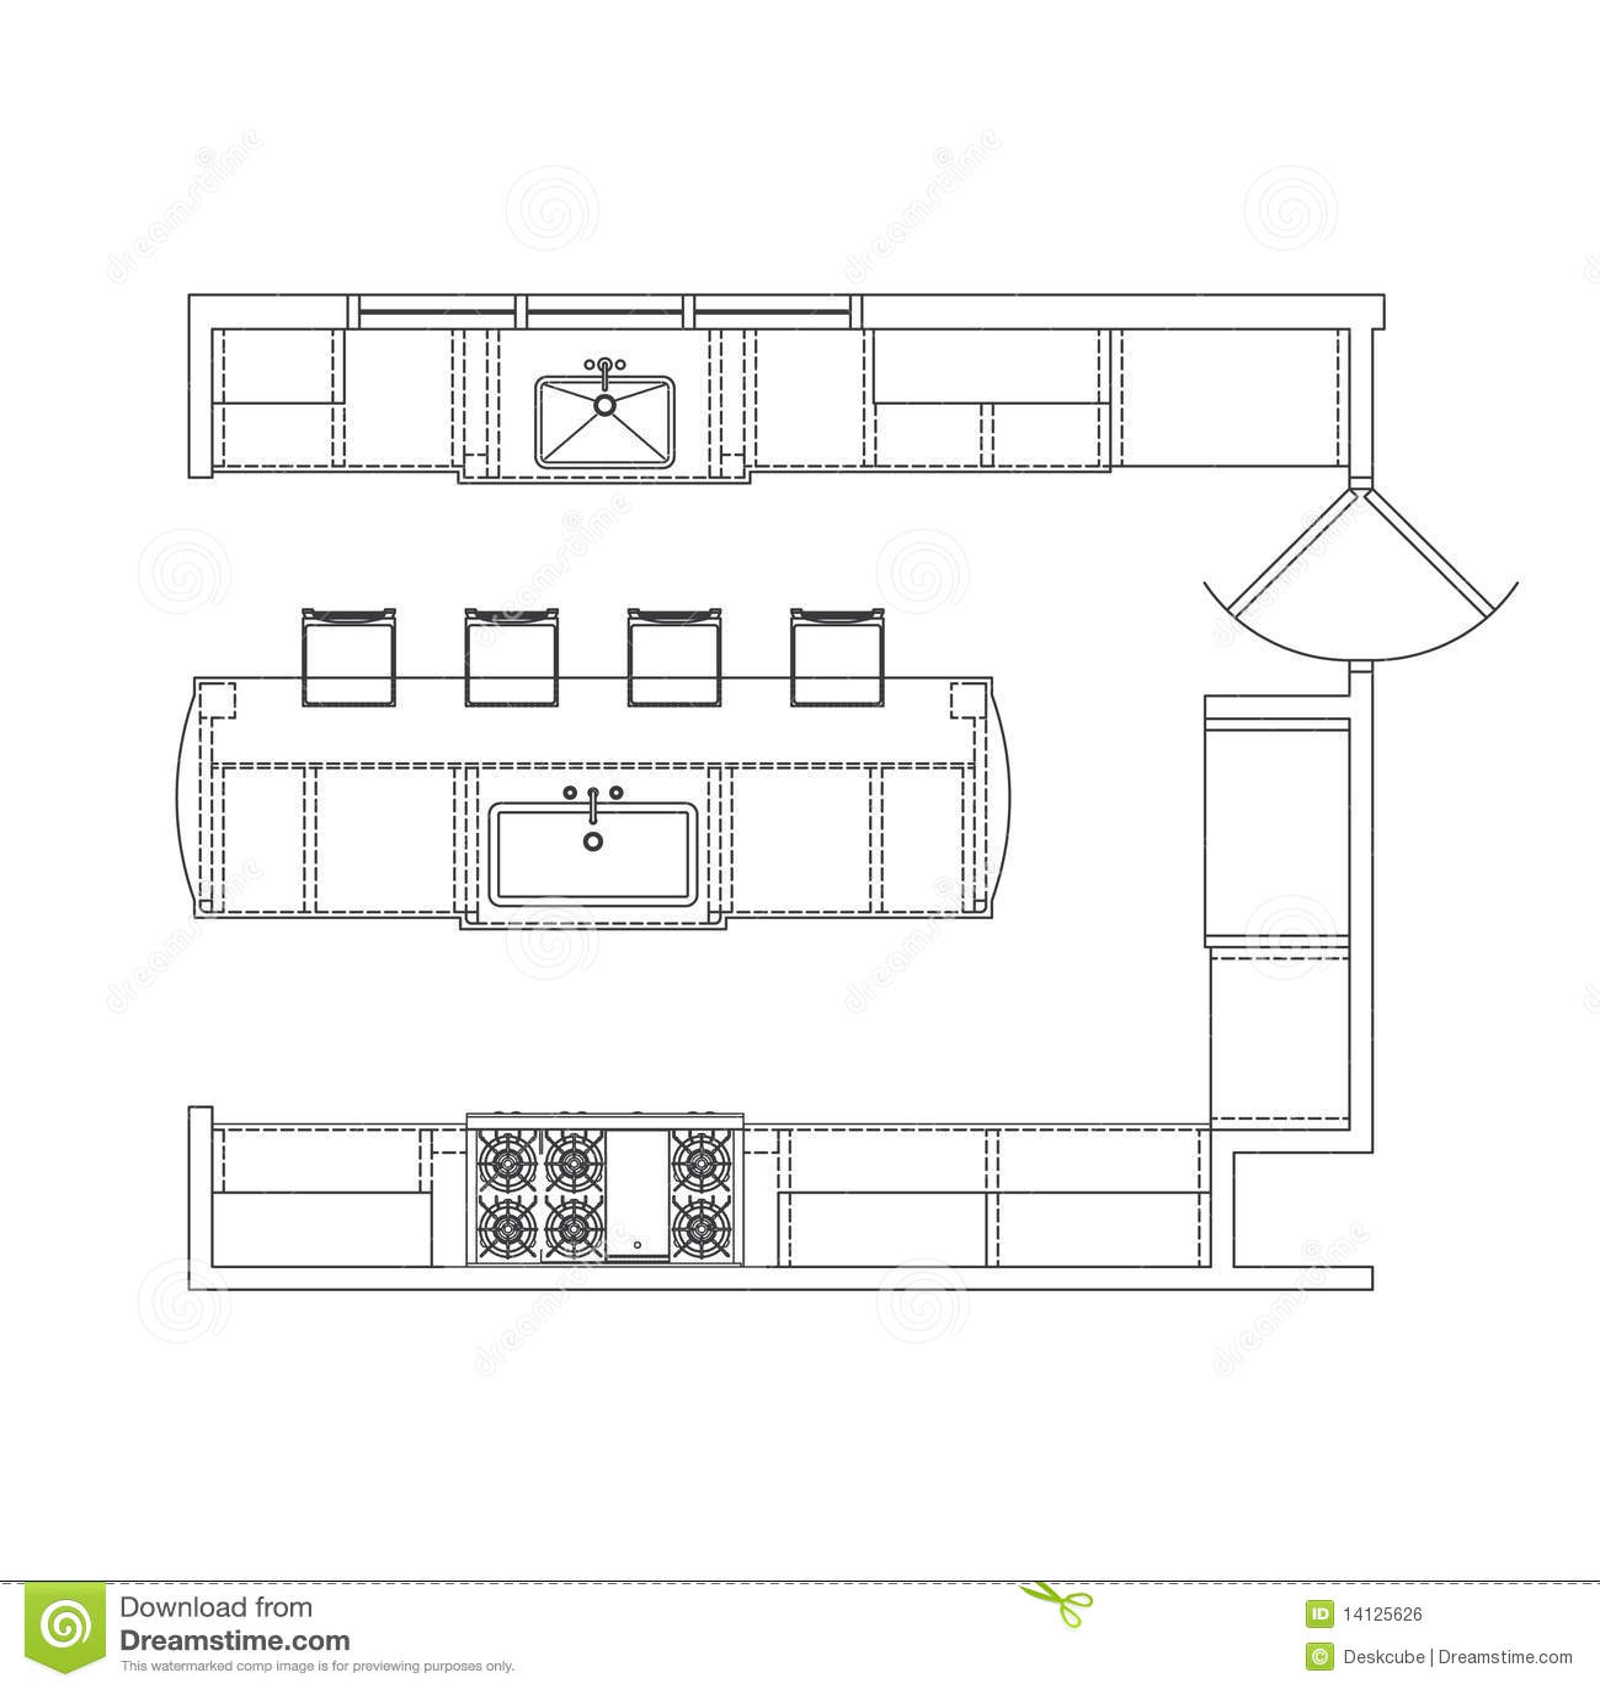 Kitchen Floor Plans And Elevations: Kitchen Plan Stock Illustration. Illustration Of Drawers